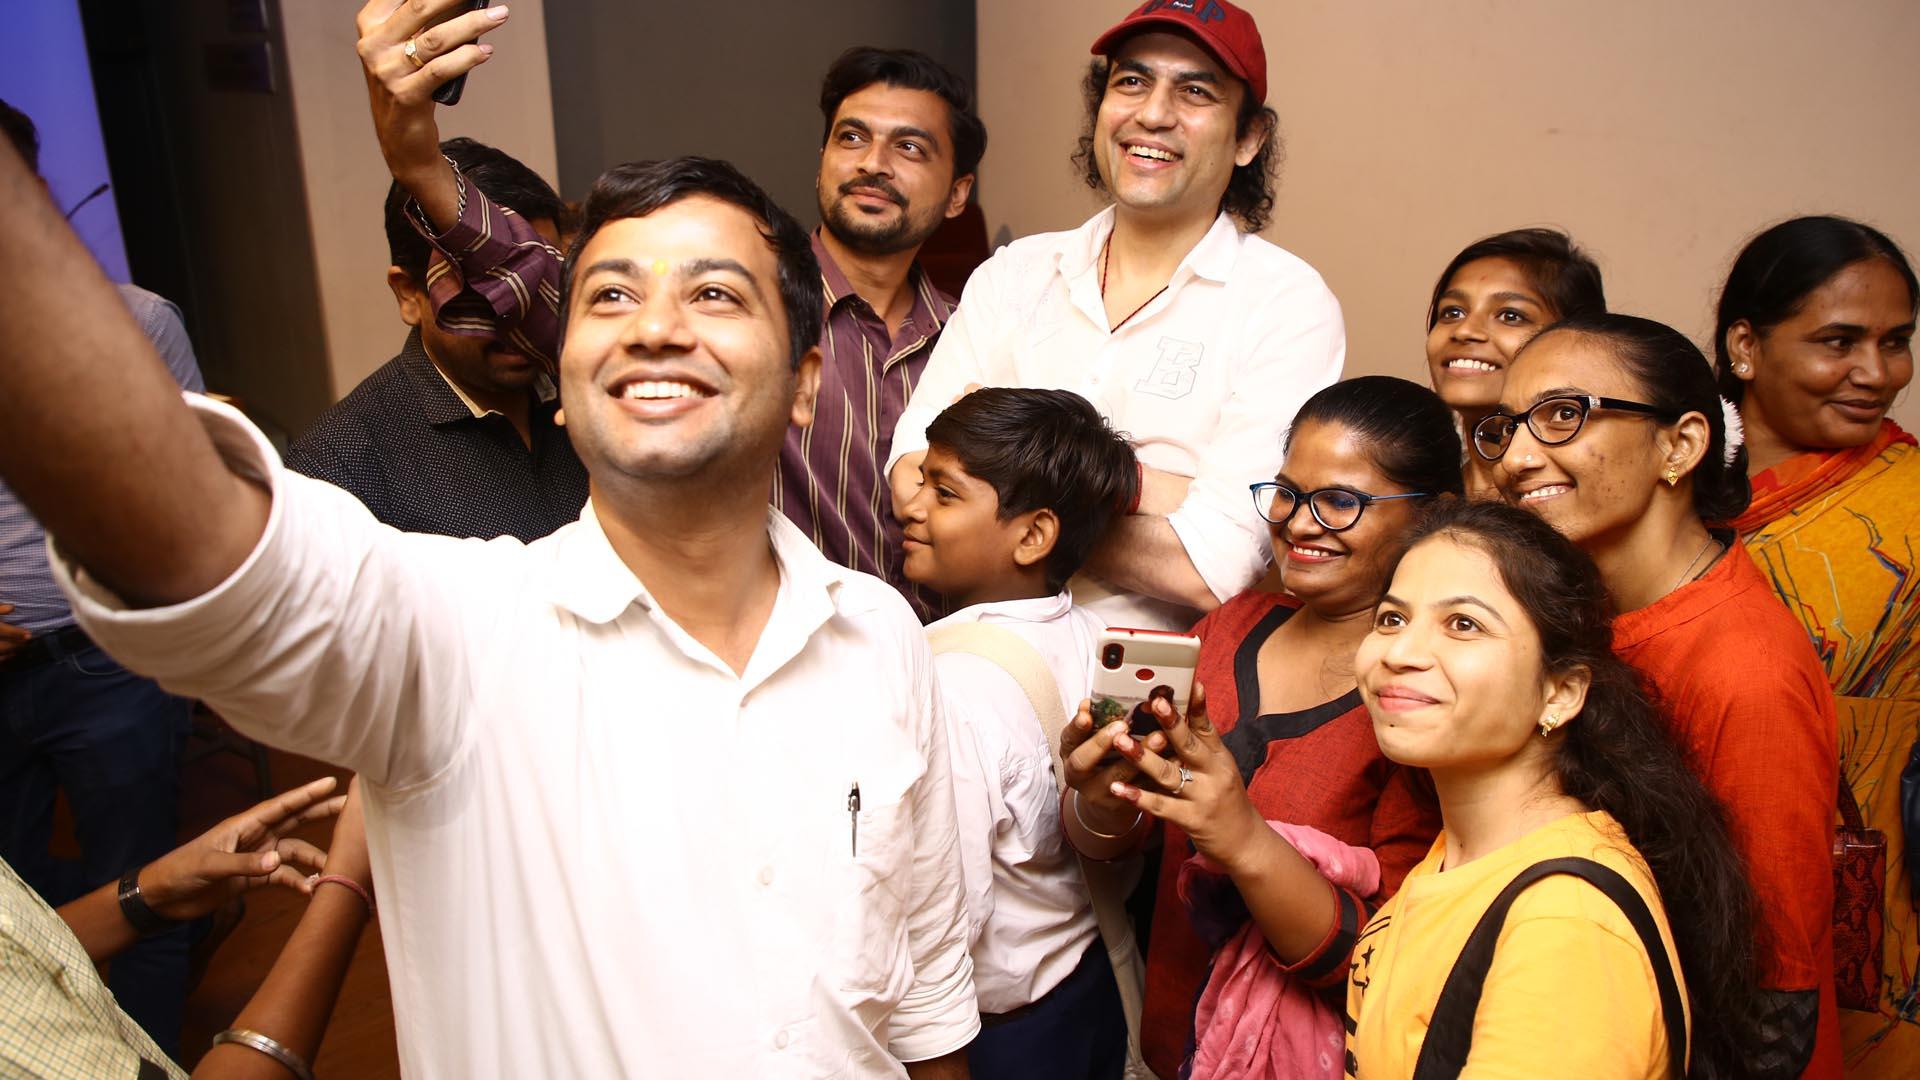 Megastar Aazaad at Ahmedabad